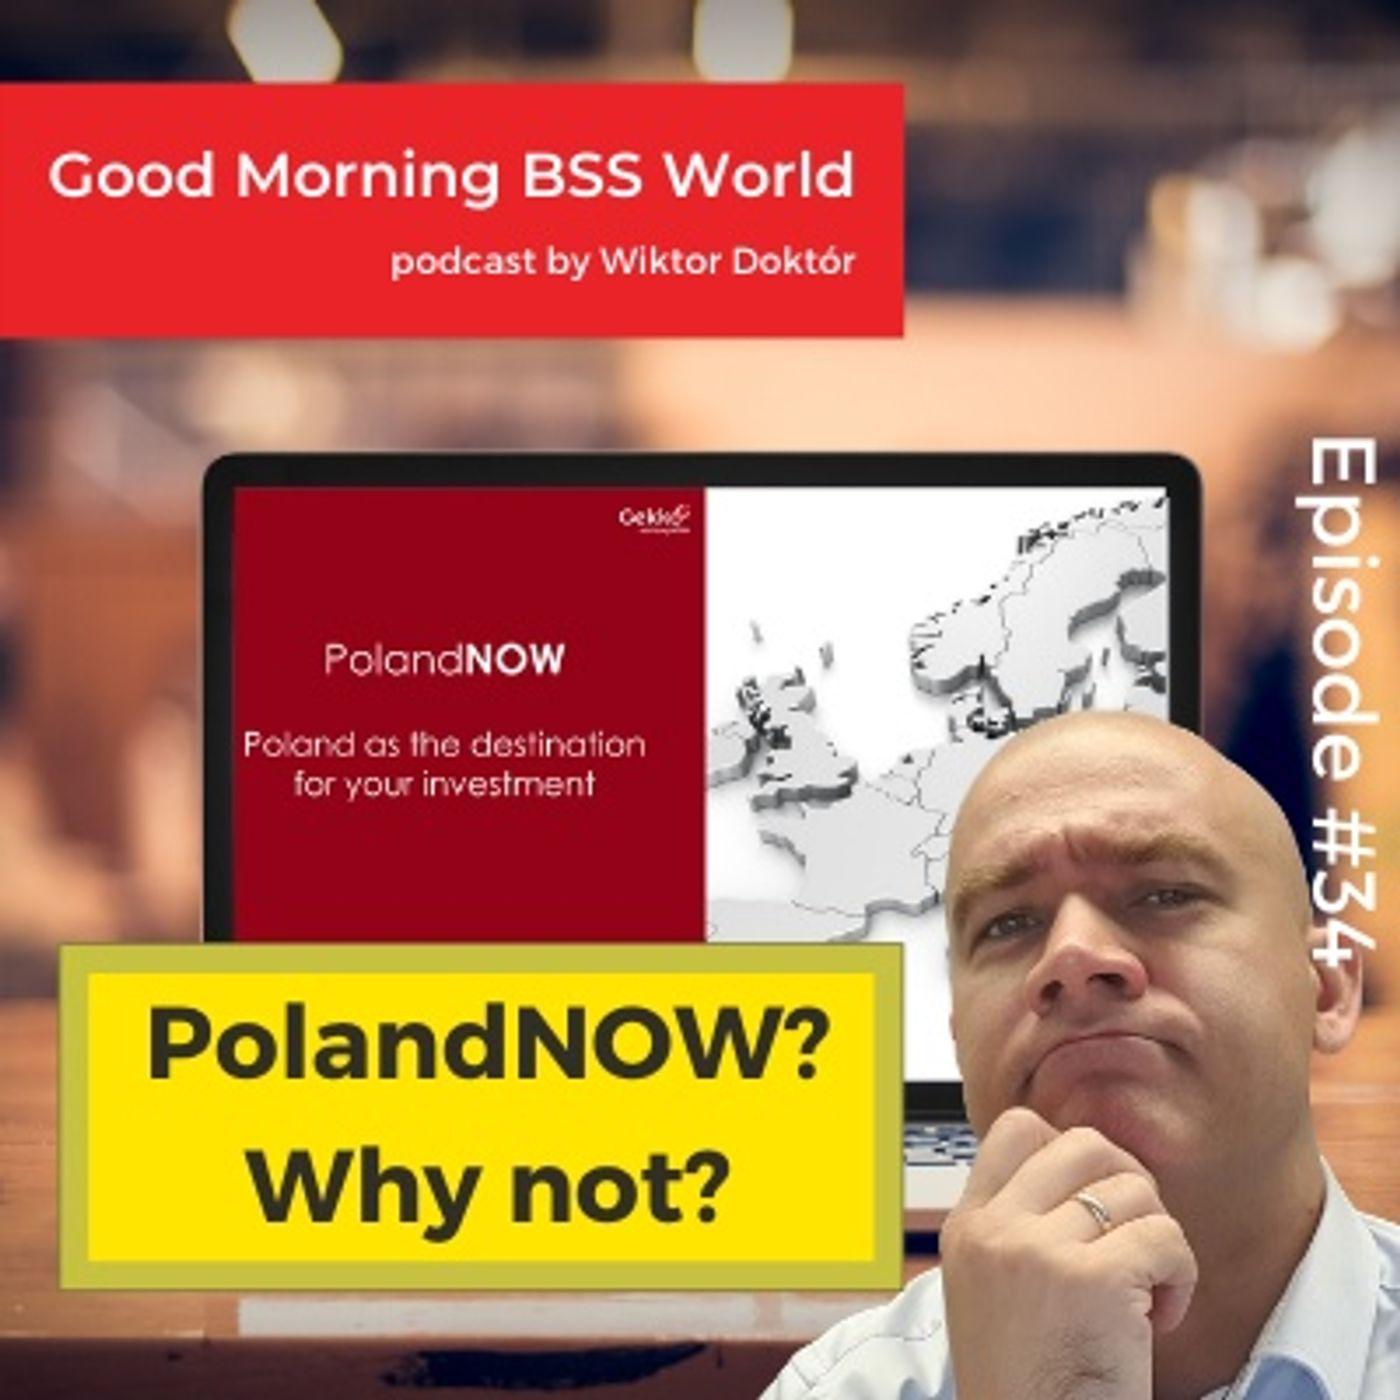 #34 PolandNOW? Why not?